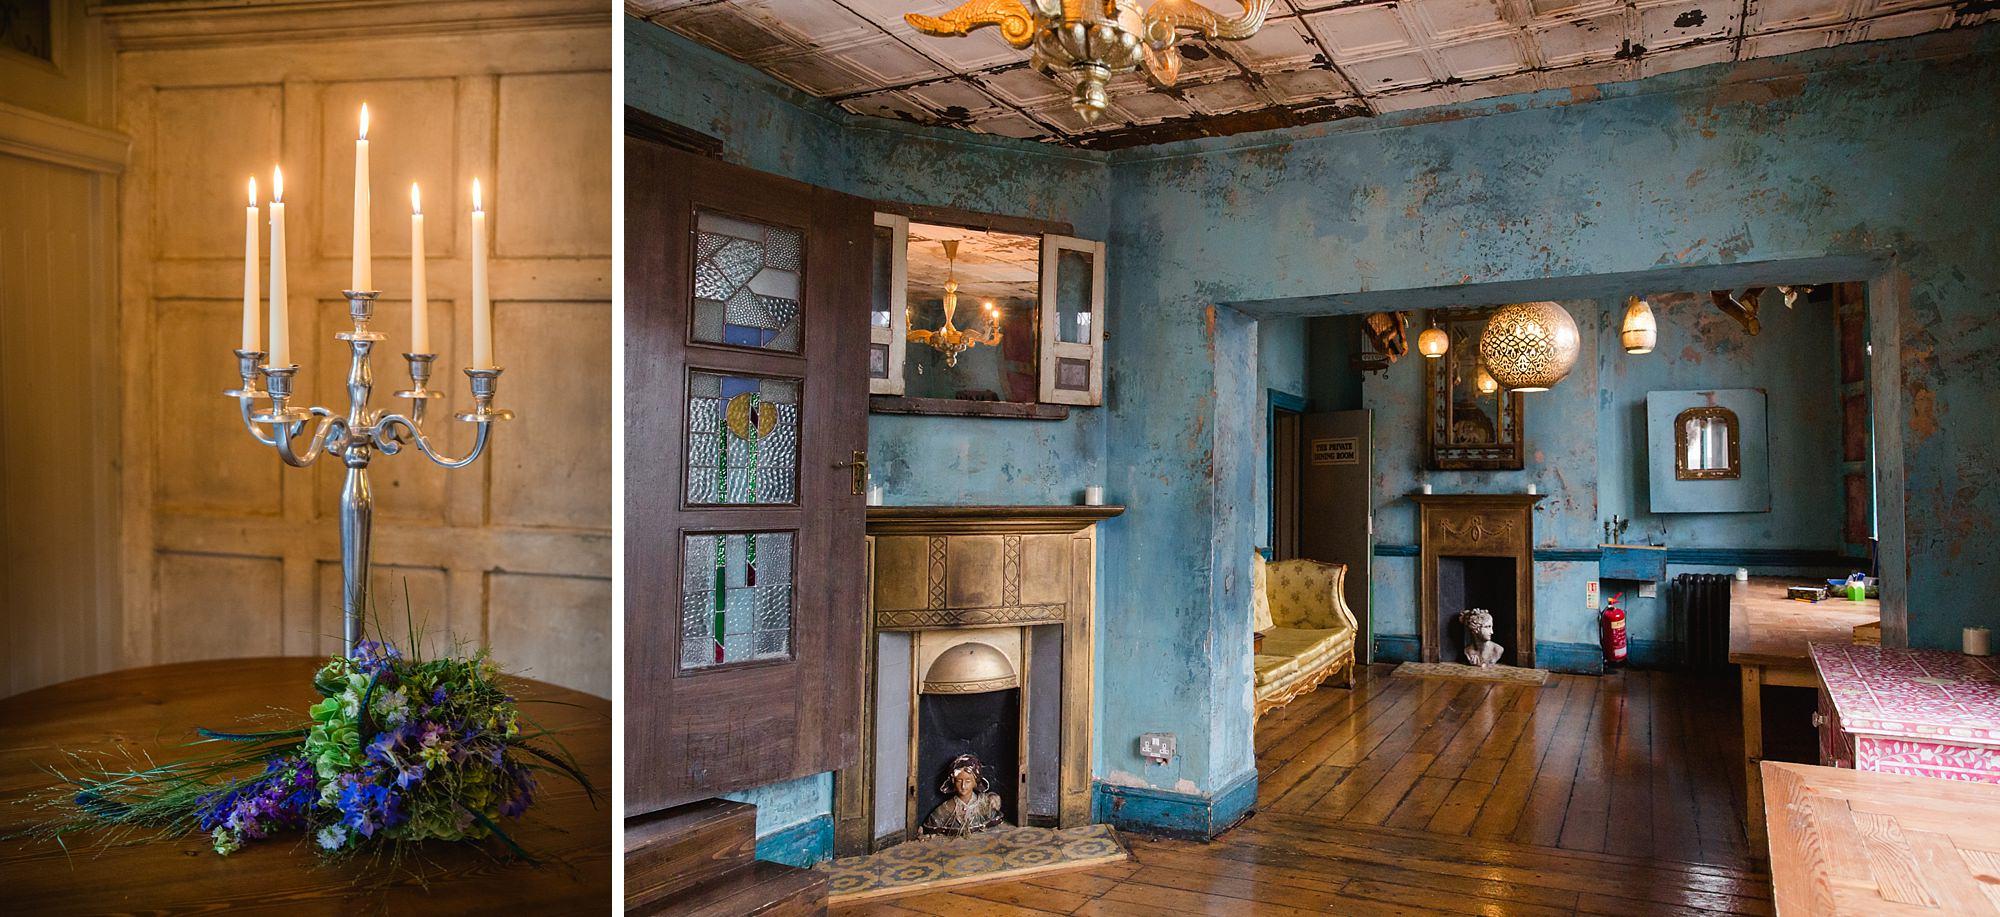 Paradise by way of Kensal Green wedding pub interior